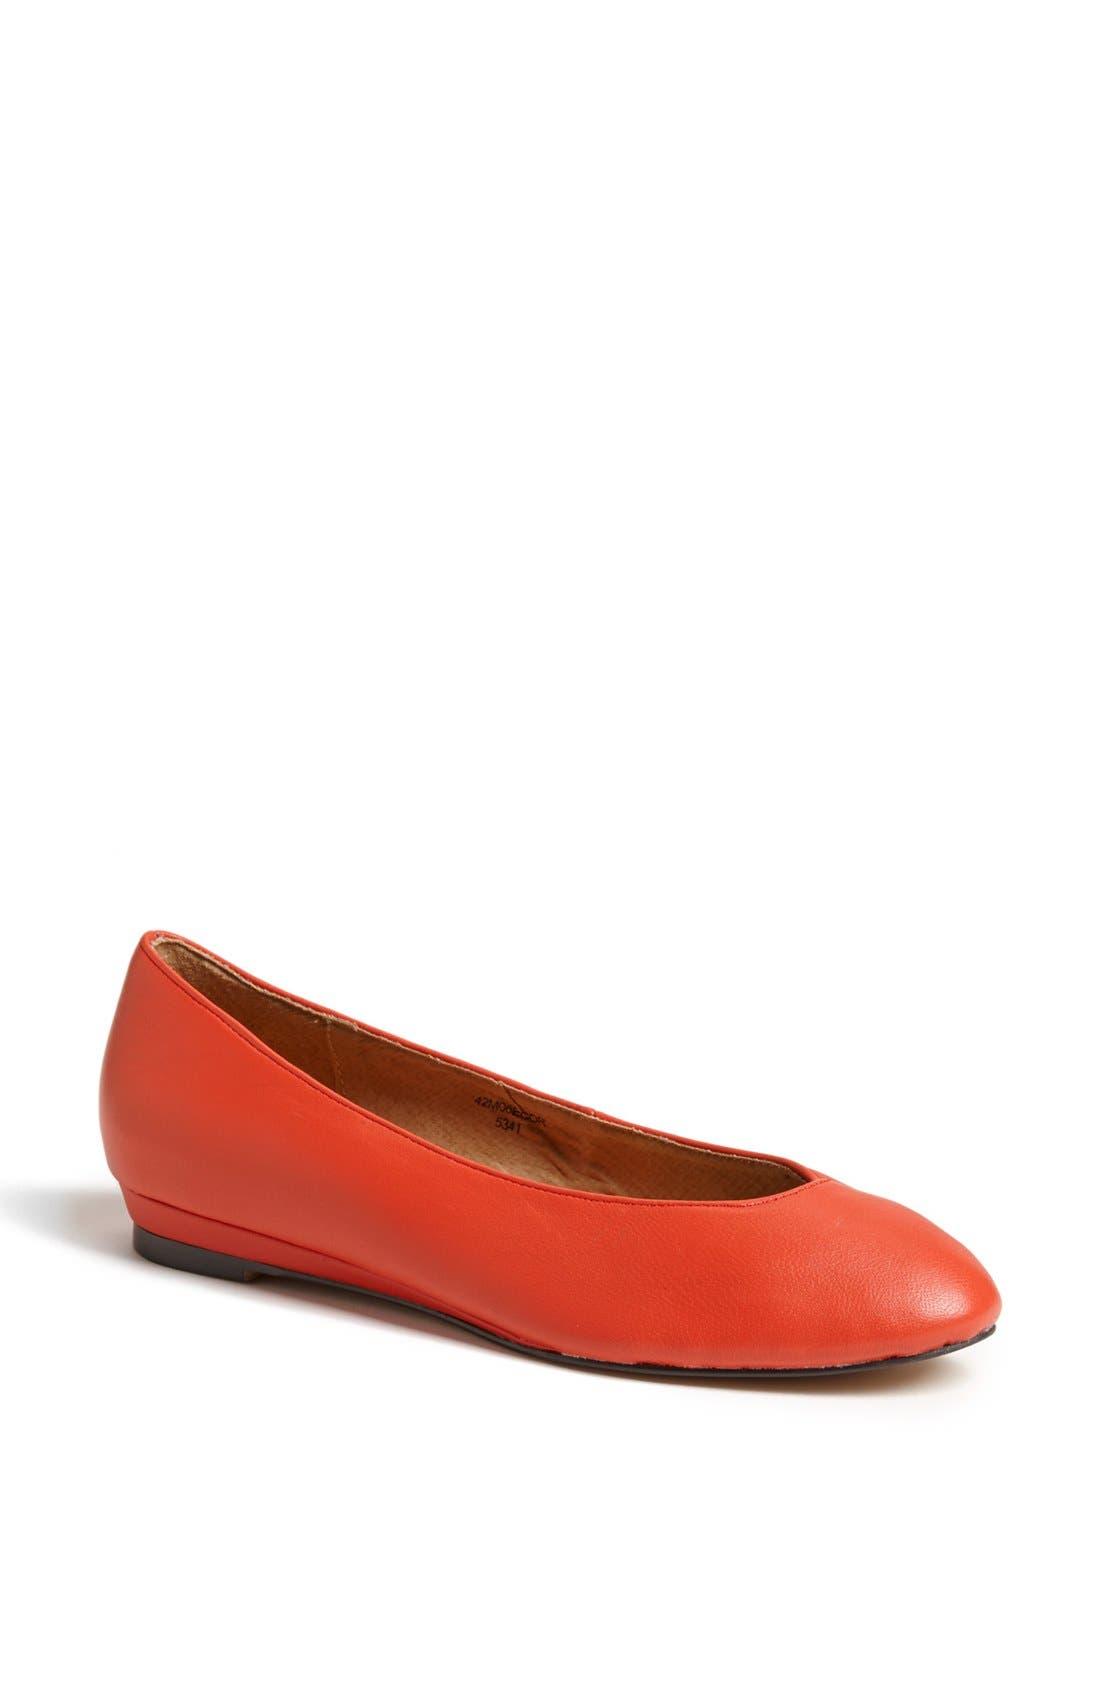 Main Image - Topshop 'Mello - Mini Wedge' Court Shoe